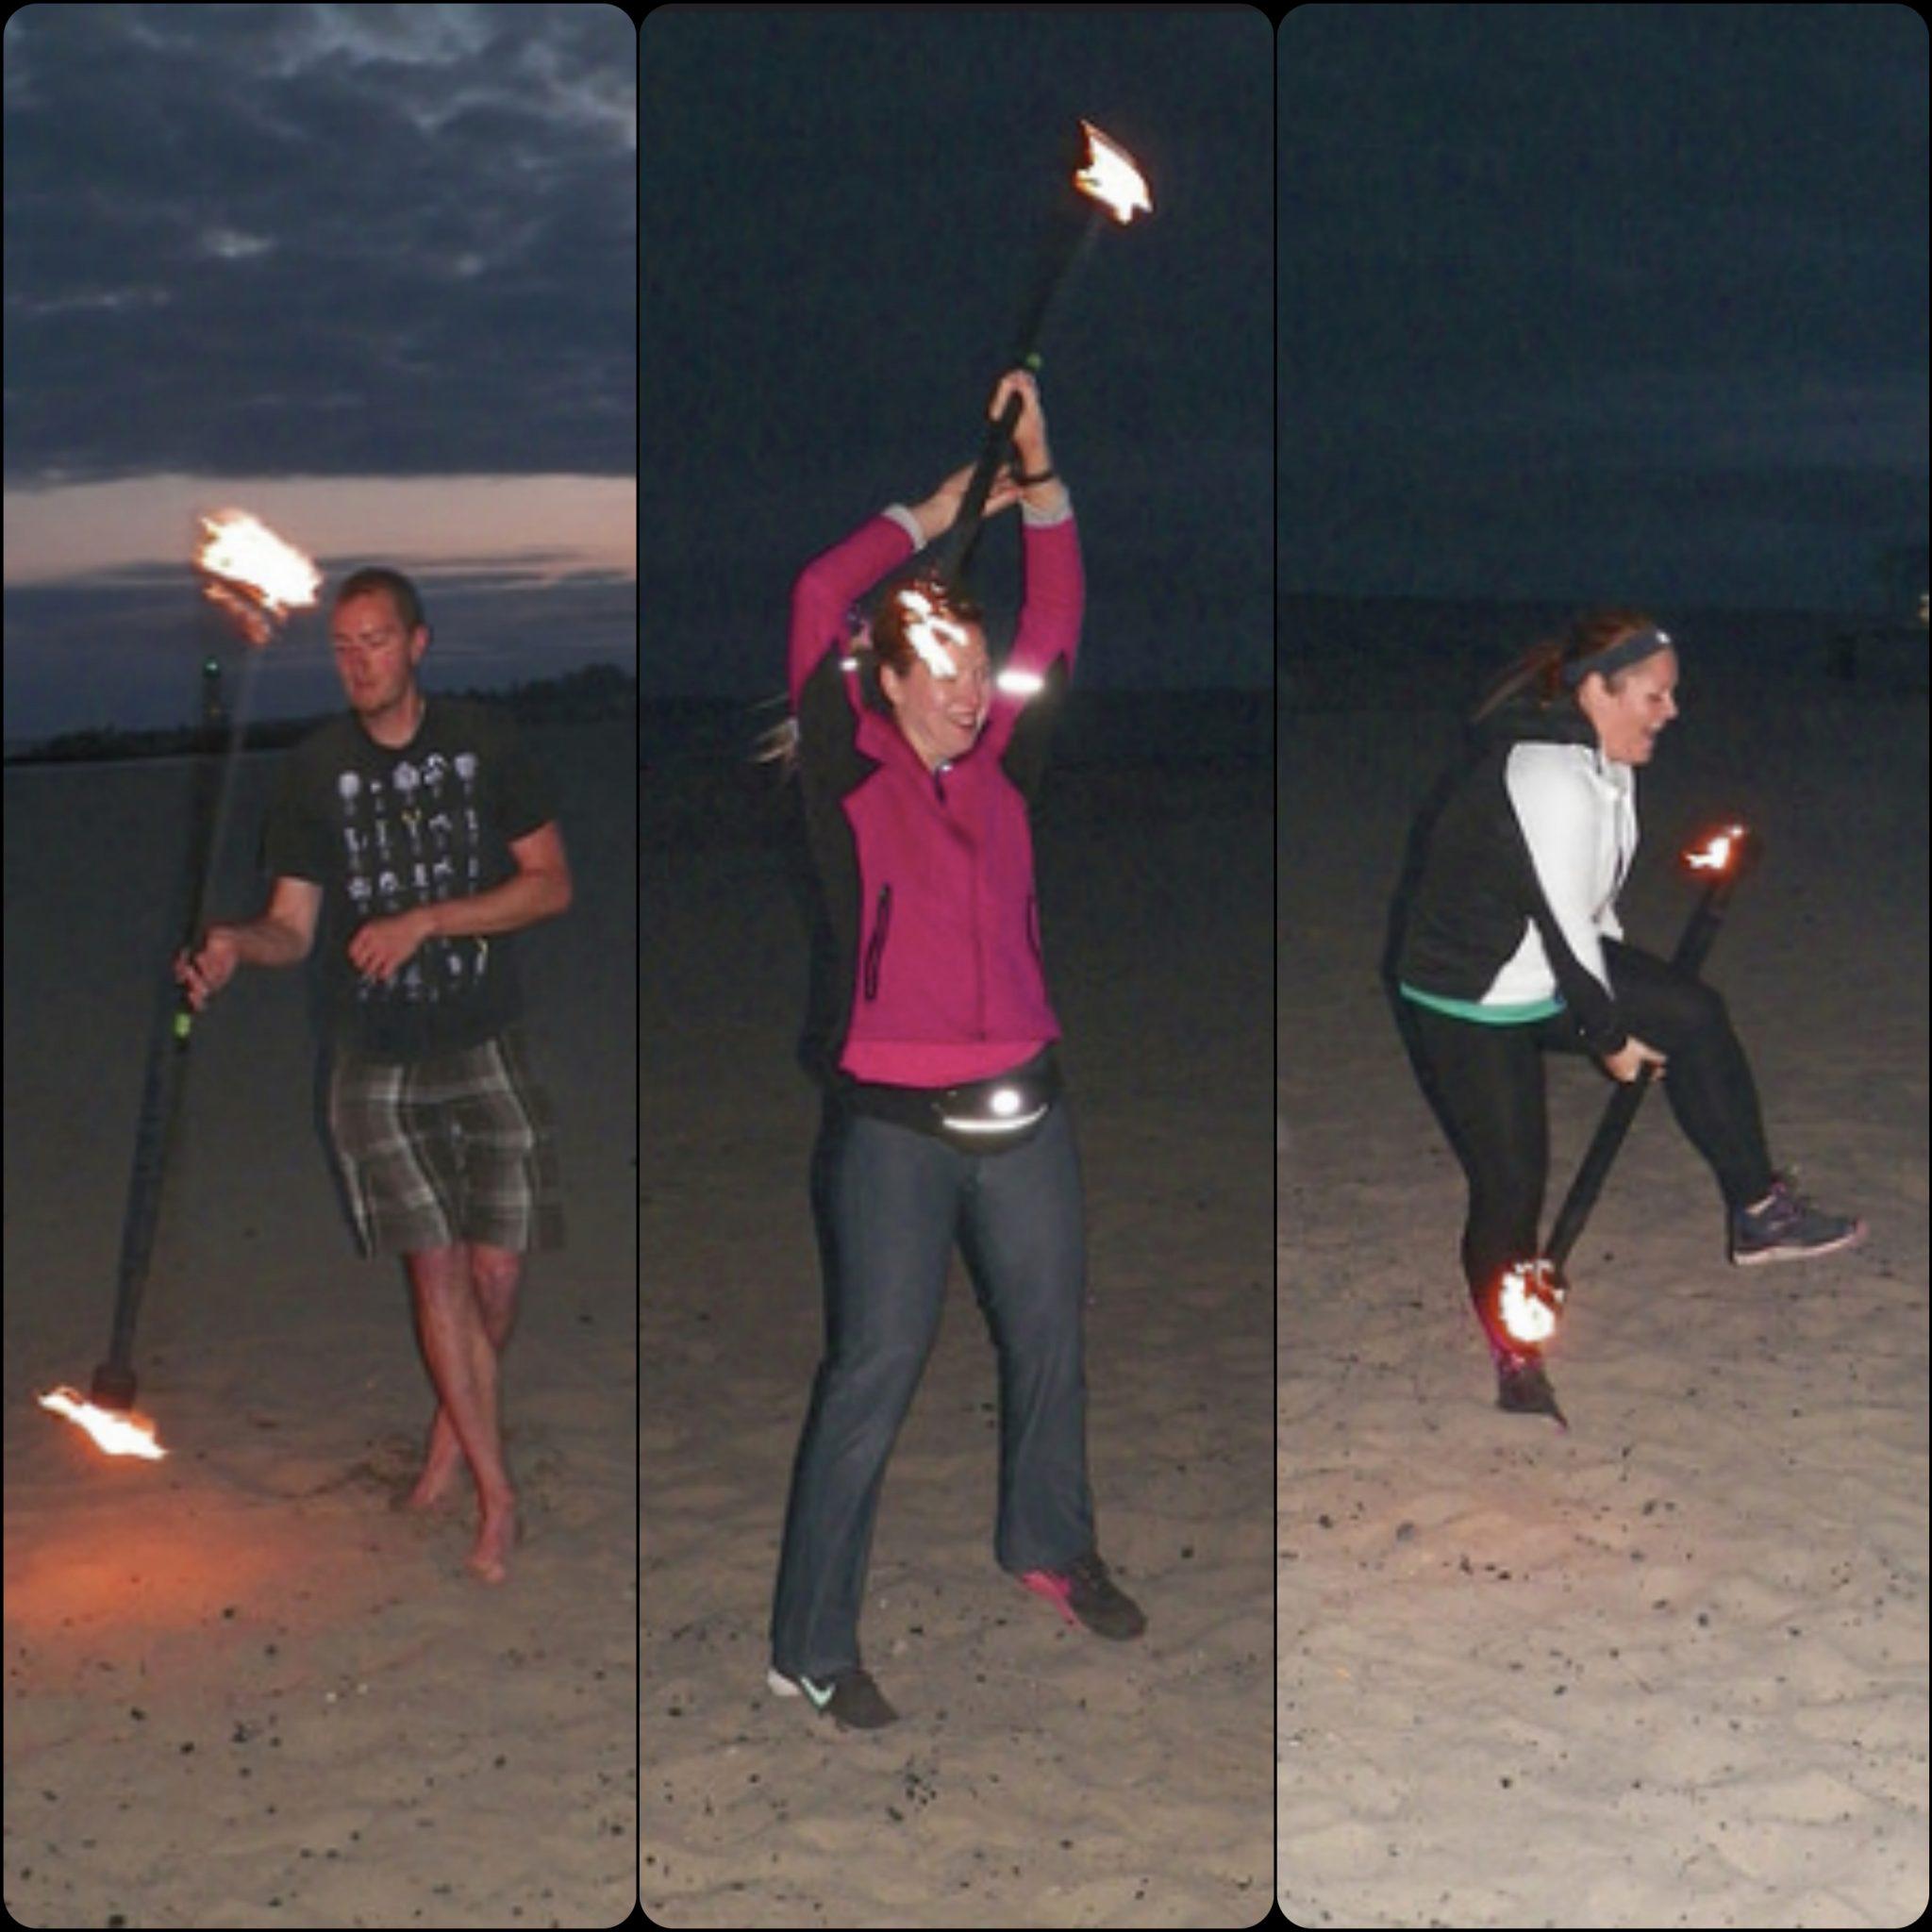 Burners